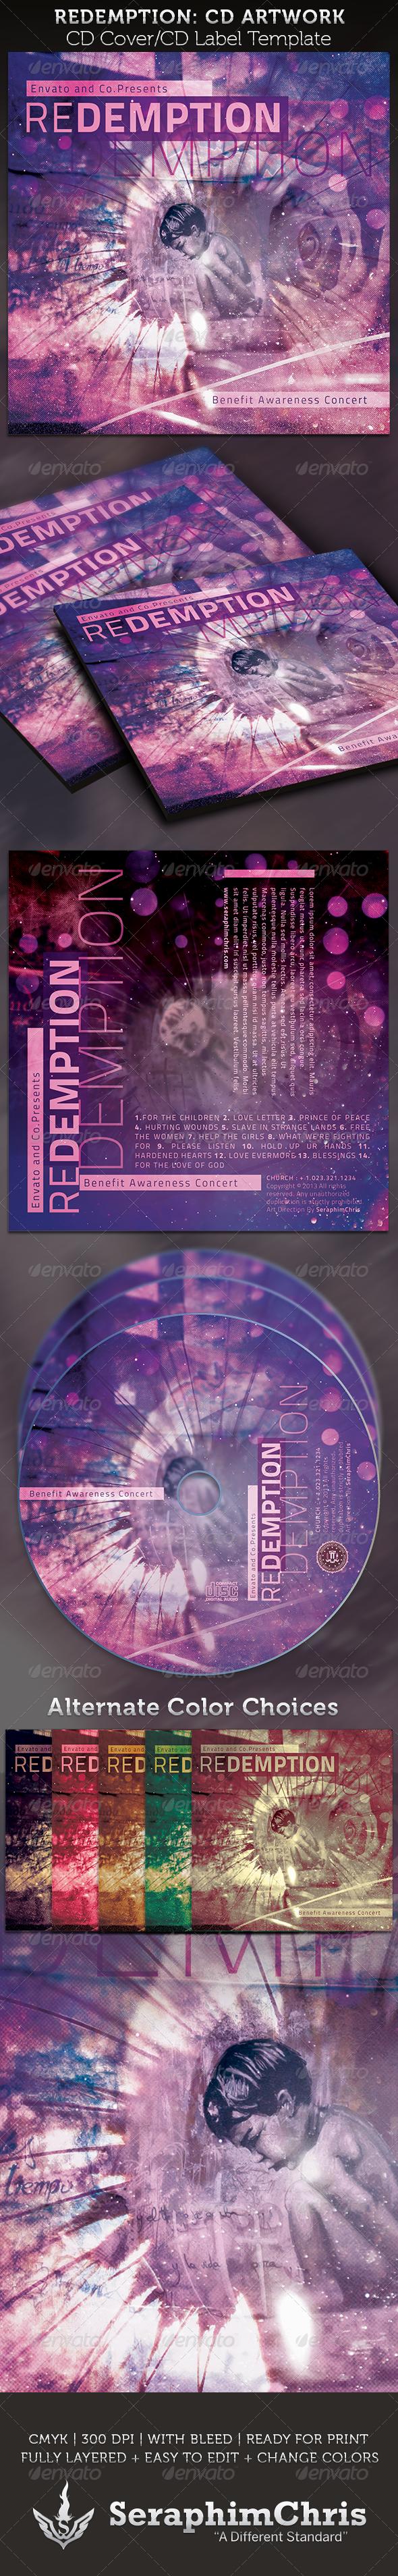 GraphicRiver Redemption Benefit Concert CD Artwork Template 3890238